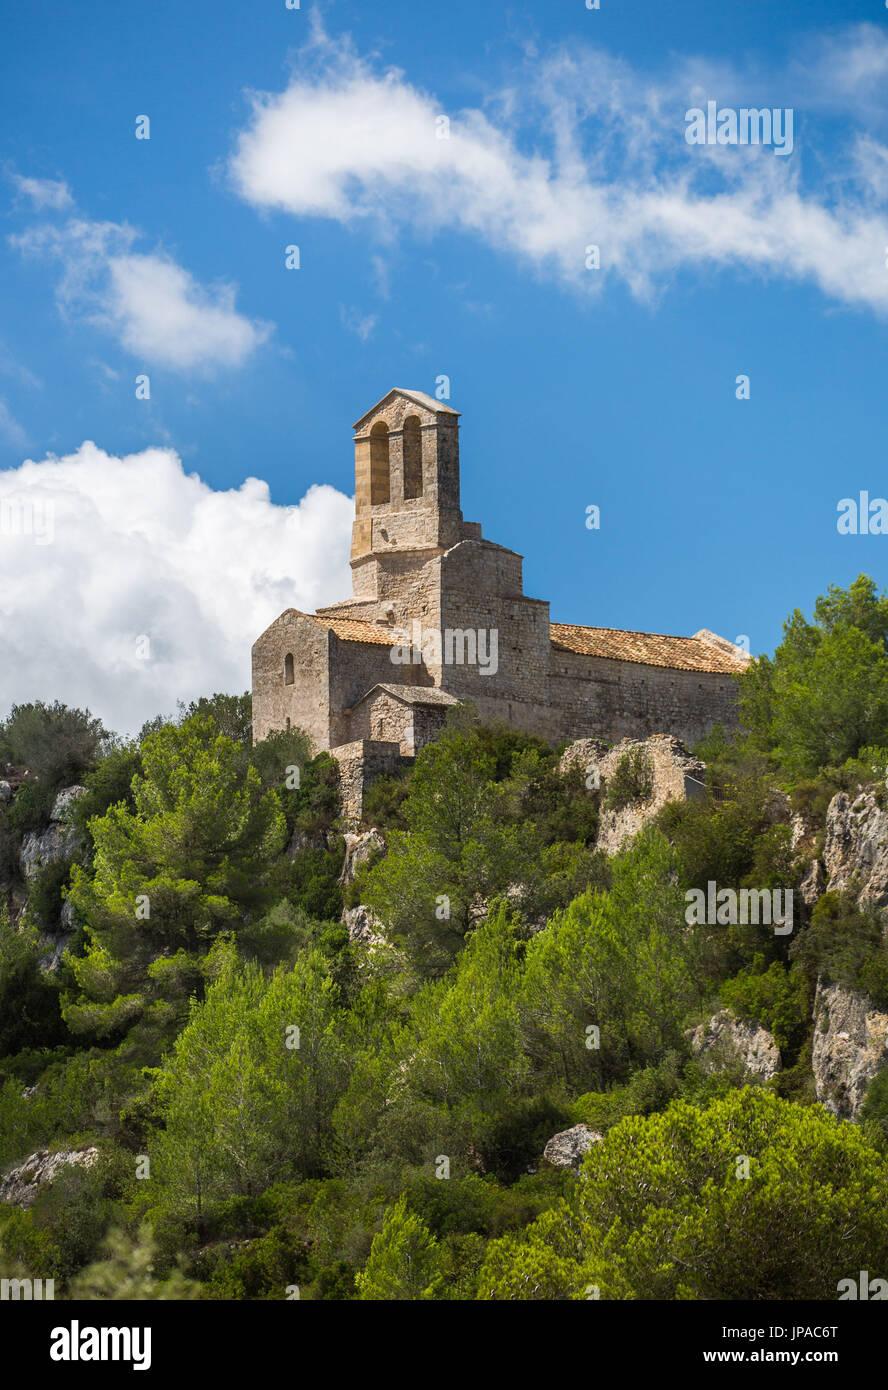 Spain, Catalonia, Barcelona province, San MIquel Church, Olerdola Castle - Stock Image